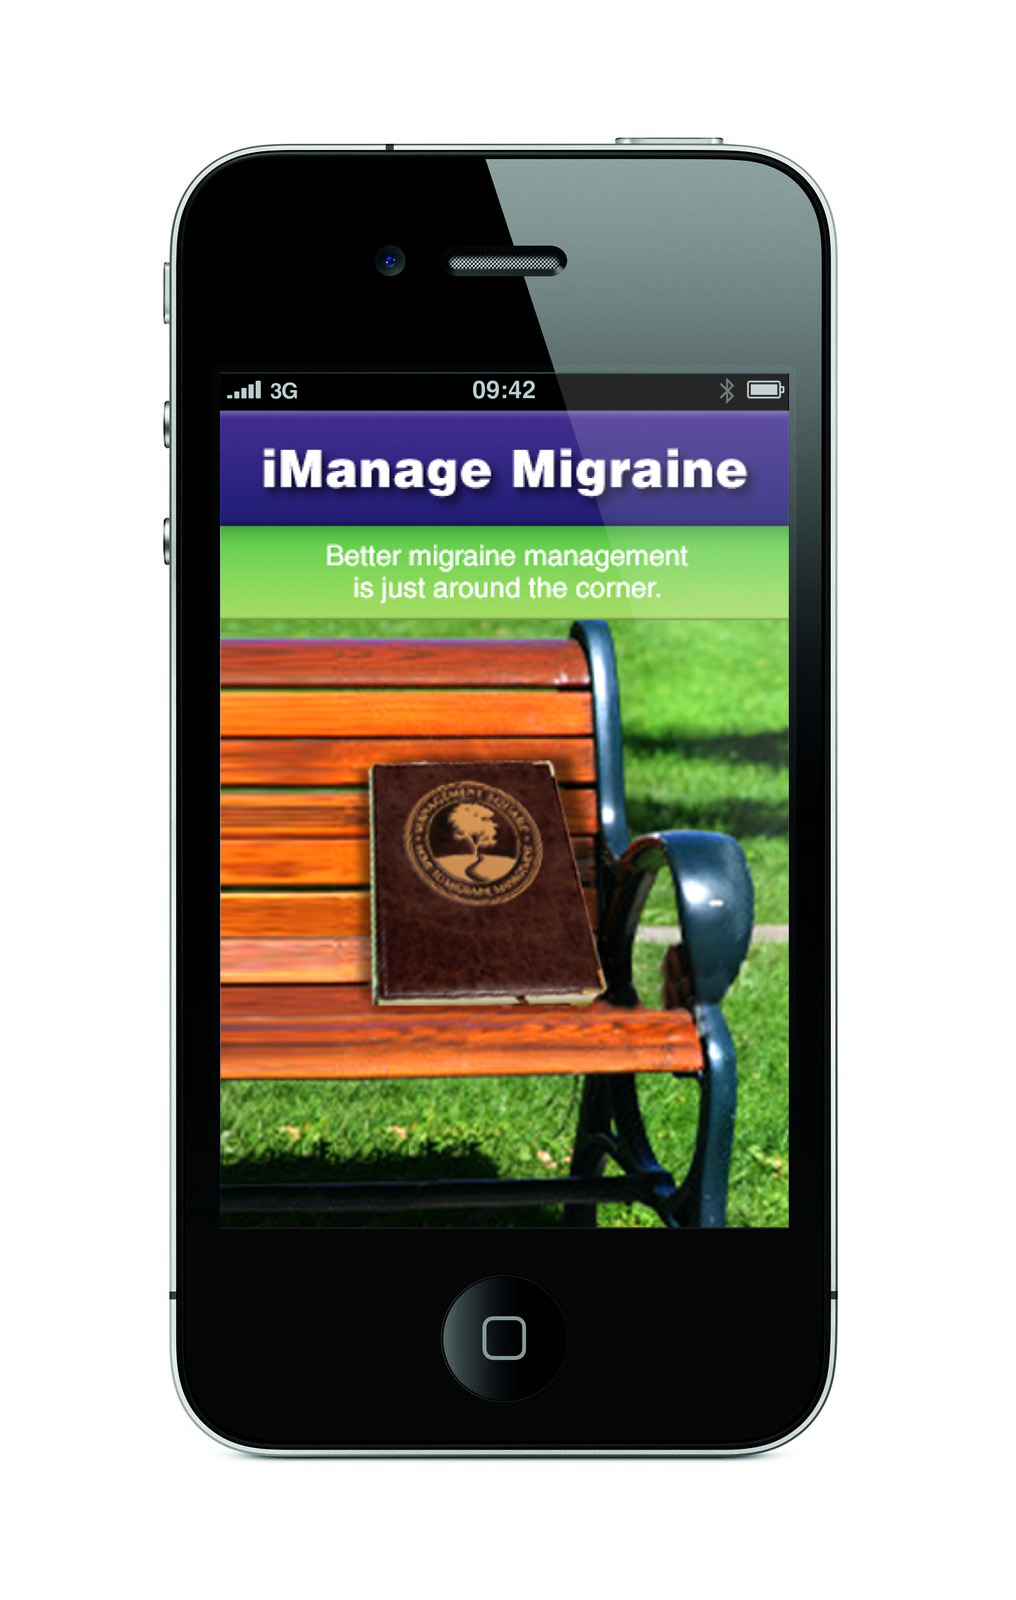 neue migr ne applikation f r iphone ipod und ipad imanage migraine mit presseportal. Black Bedroom Furniture Sets. Home Design Ideas